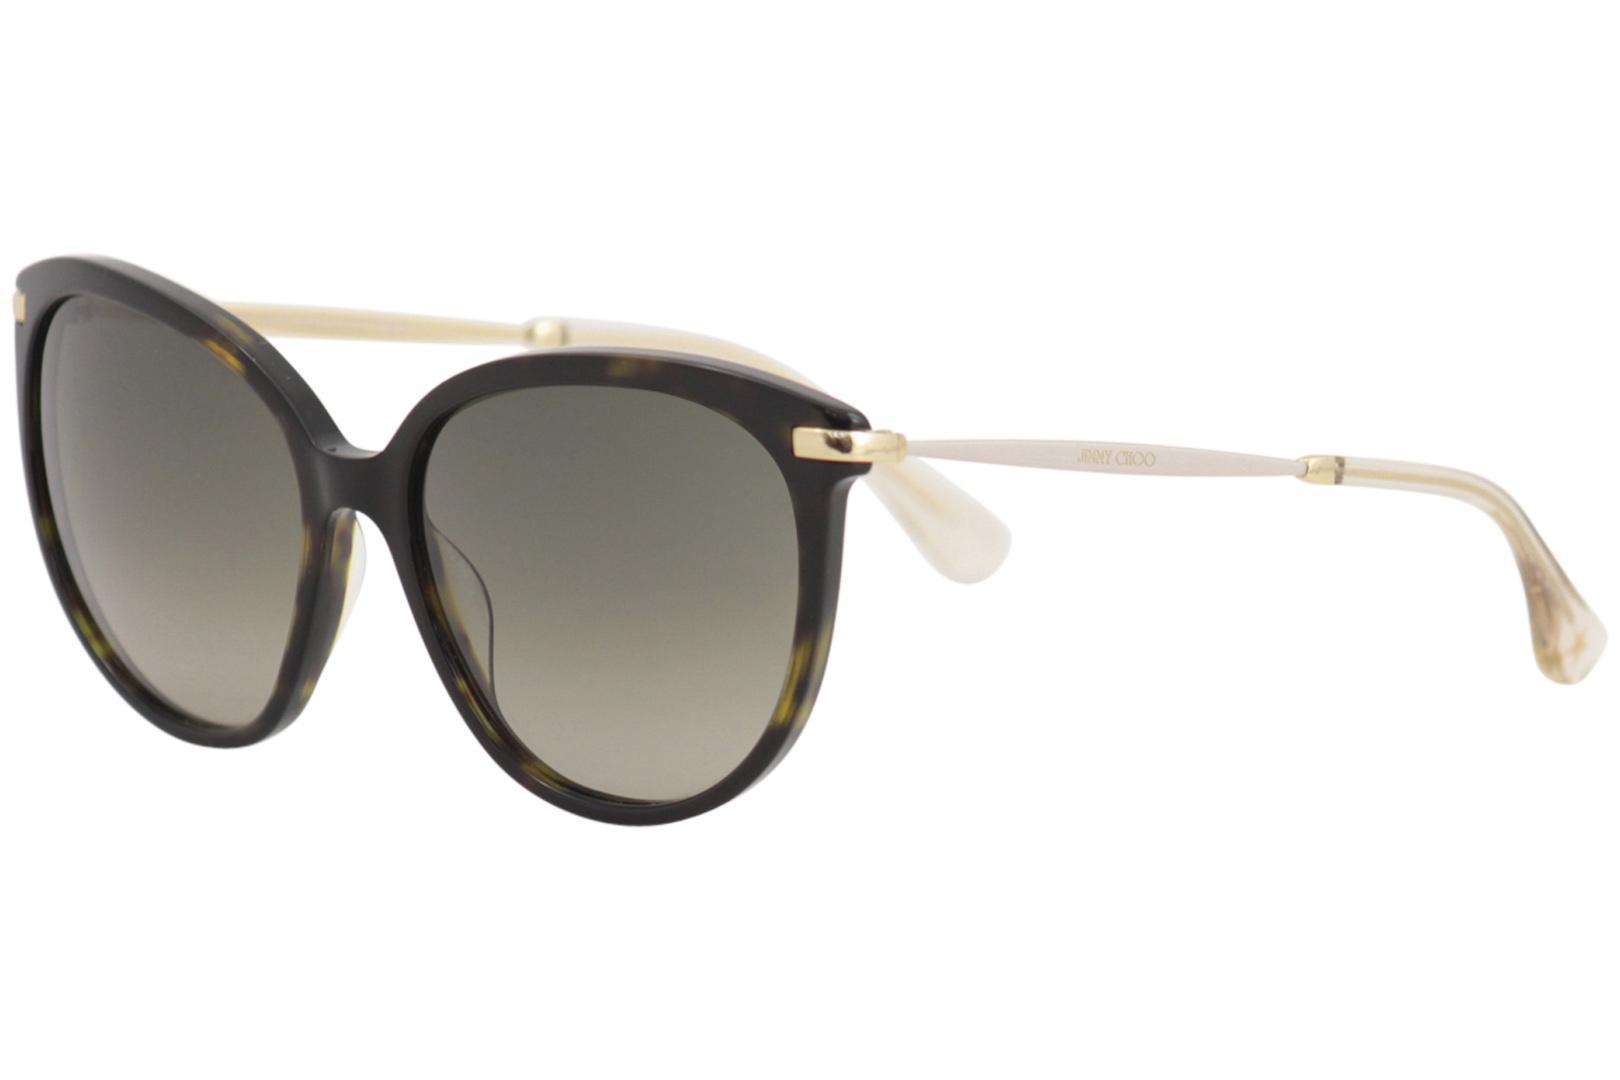 fb0f1e6032cb Top Jimmy Choo products. Jimmy Choo Women s Cindy S Fashion Square  Sunglasses